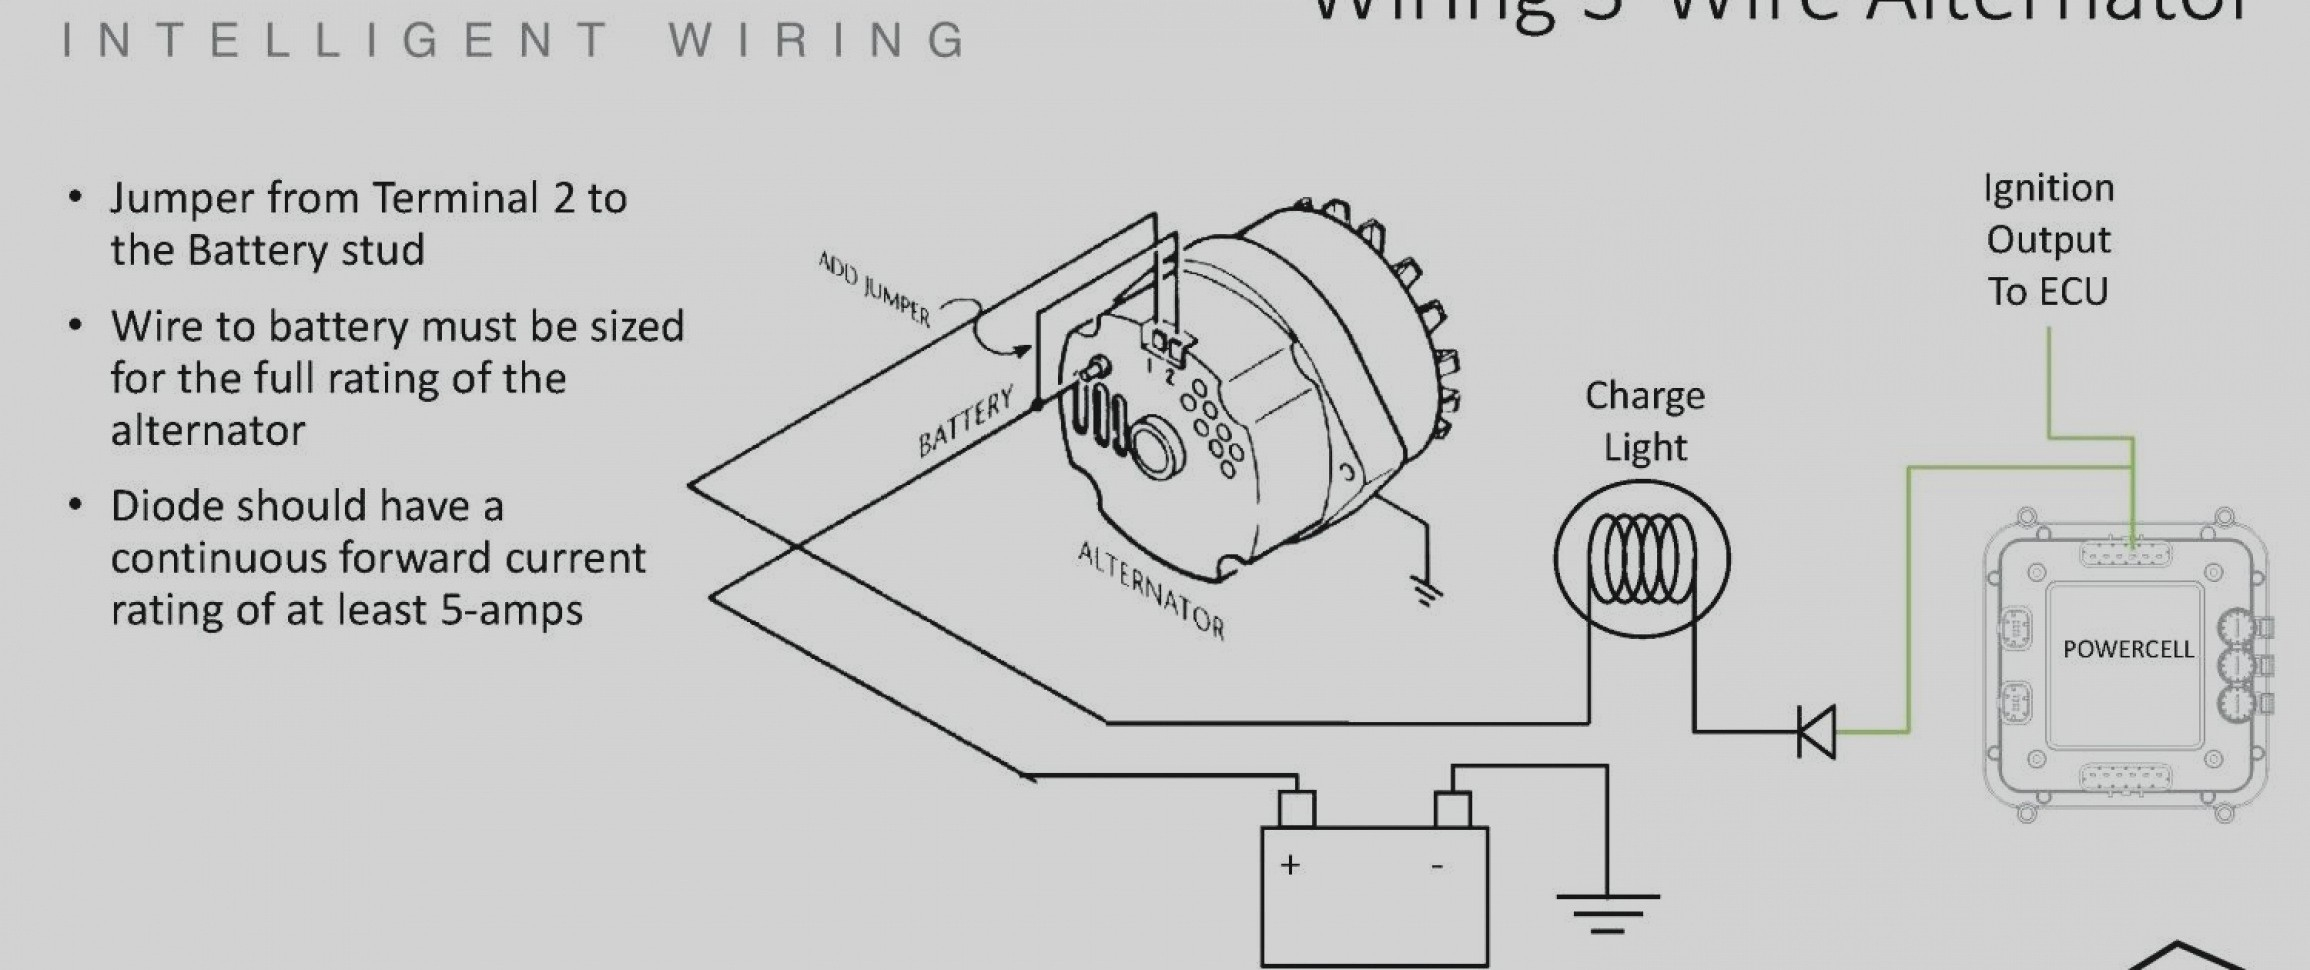 Basic Gm Alternator Wiring Diagram